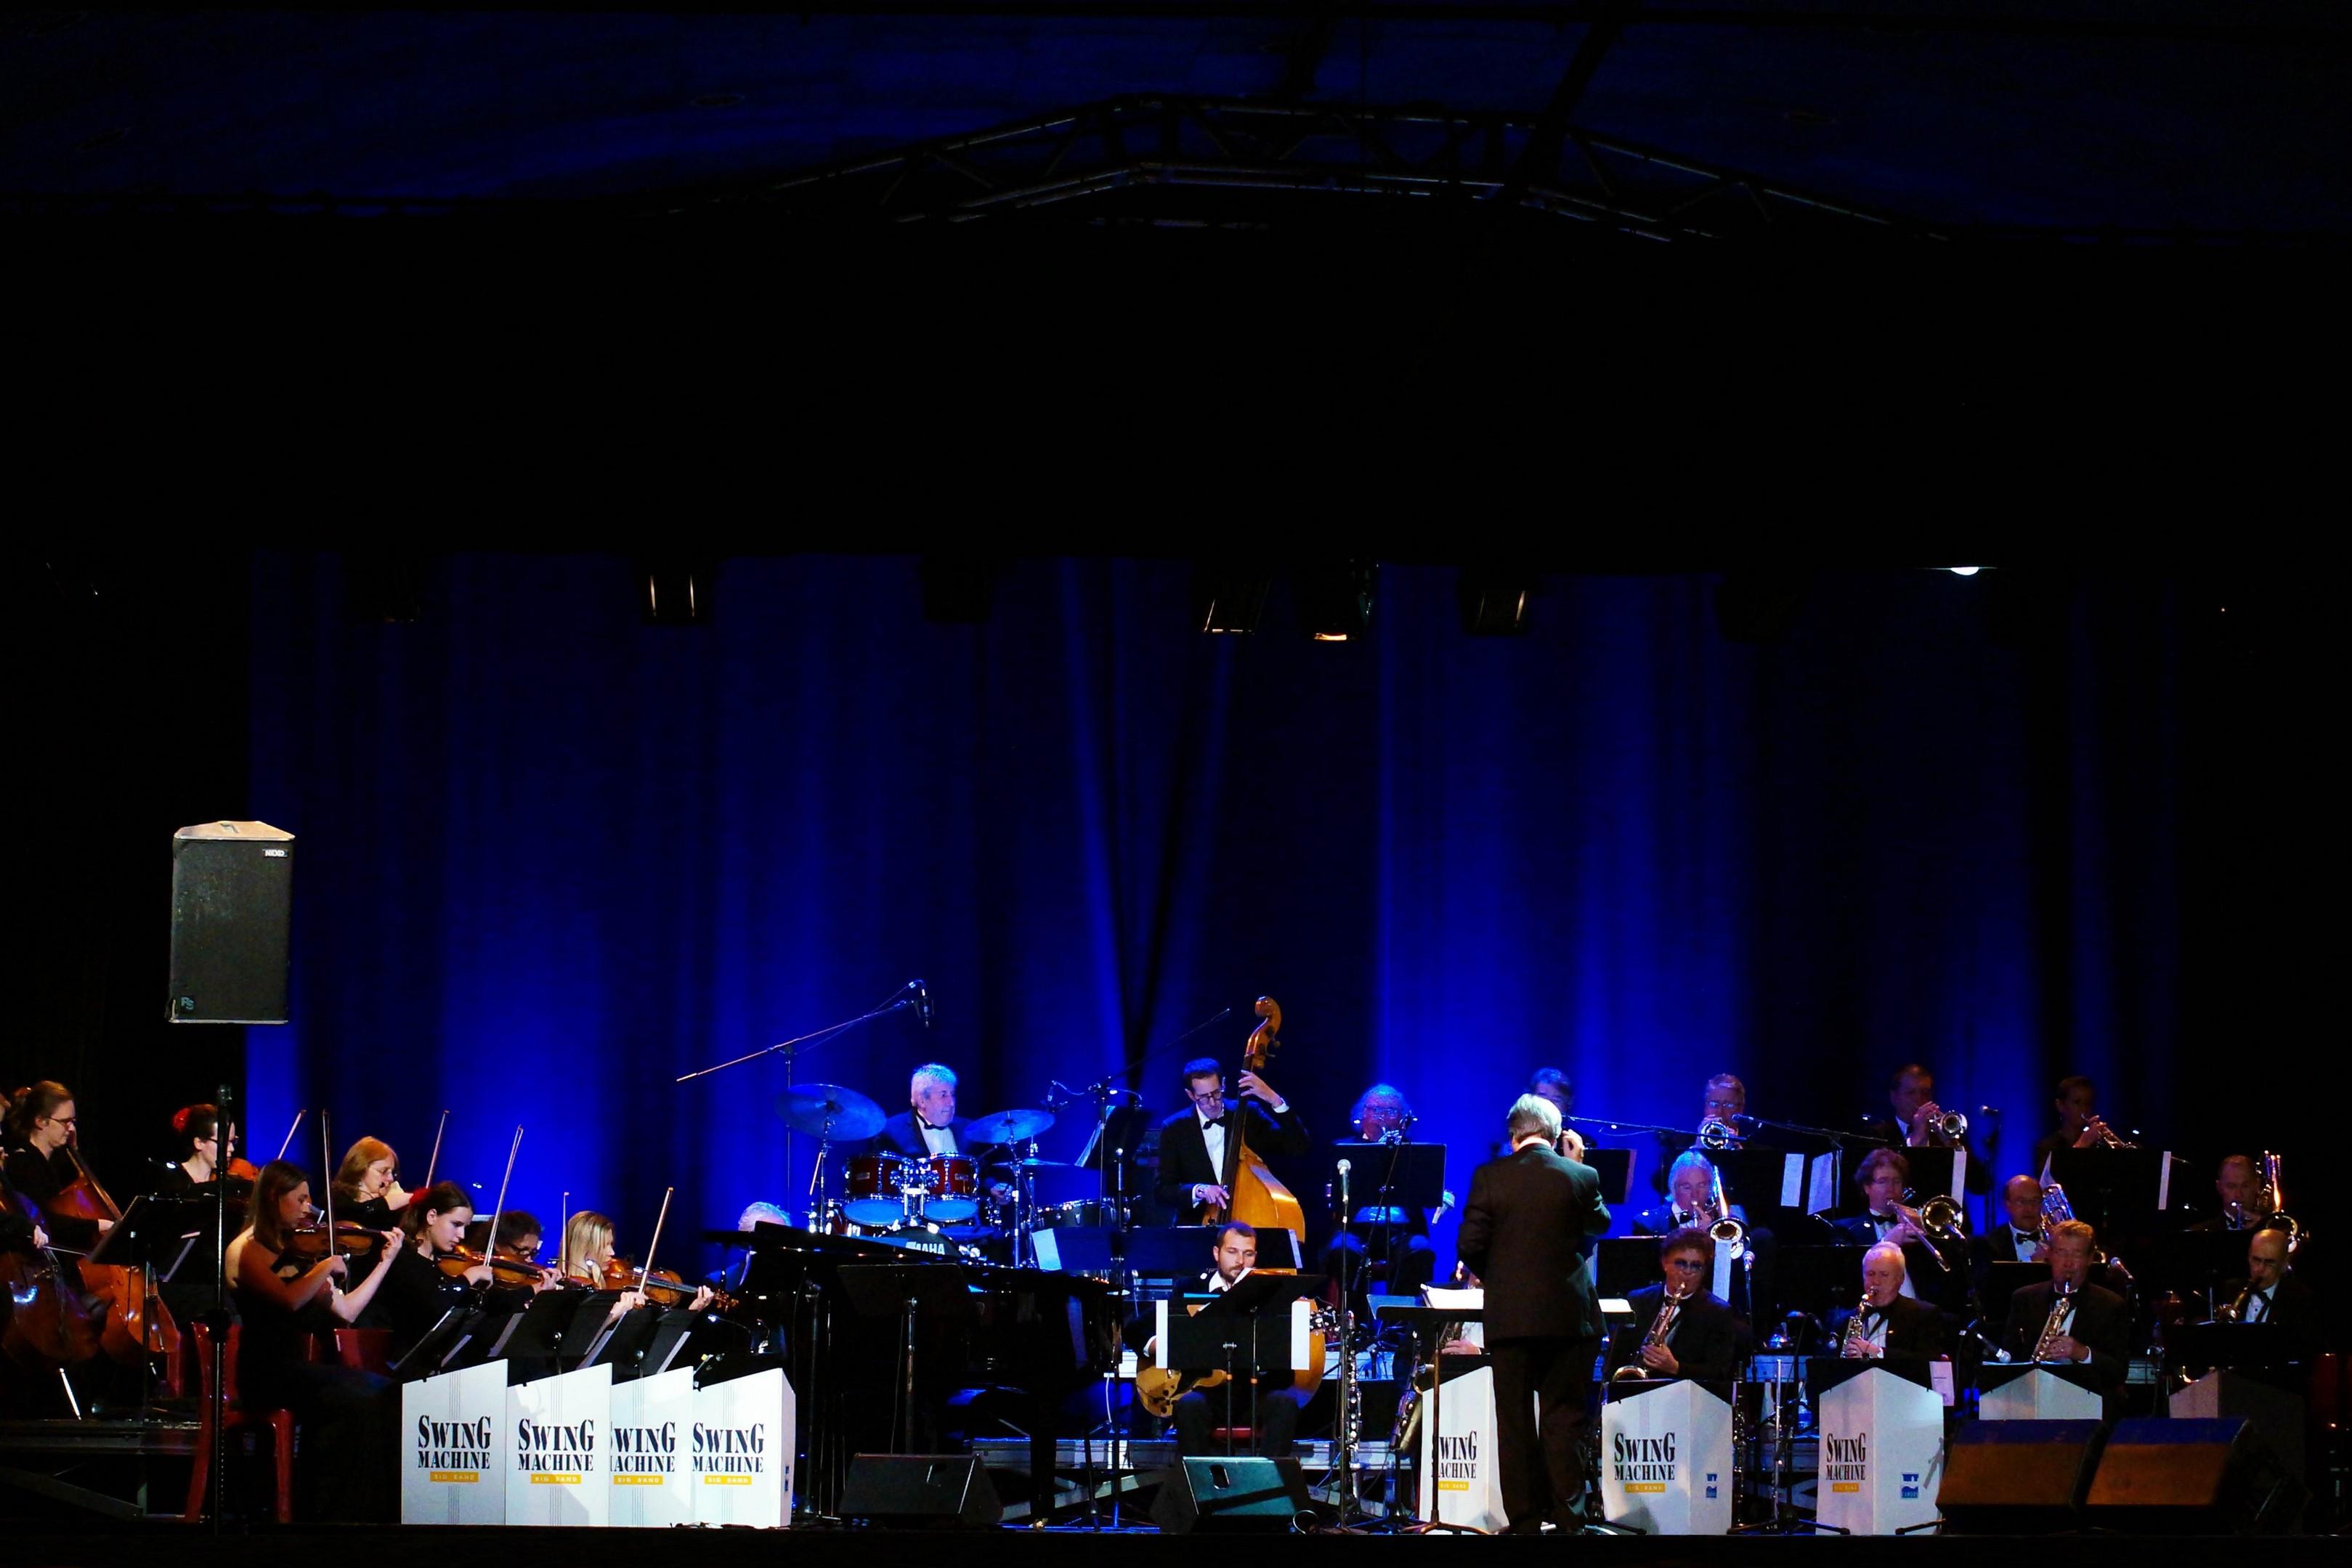 Cahors : Concert hommage à Gershwin du Swing Machine Big Band - Medialot